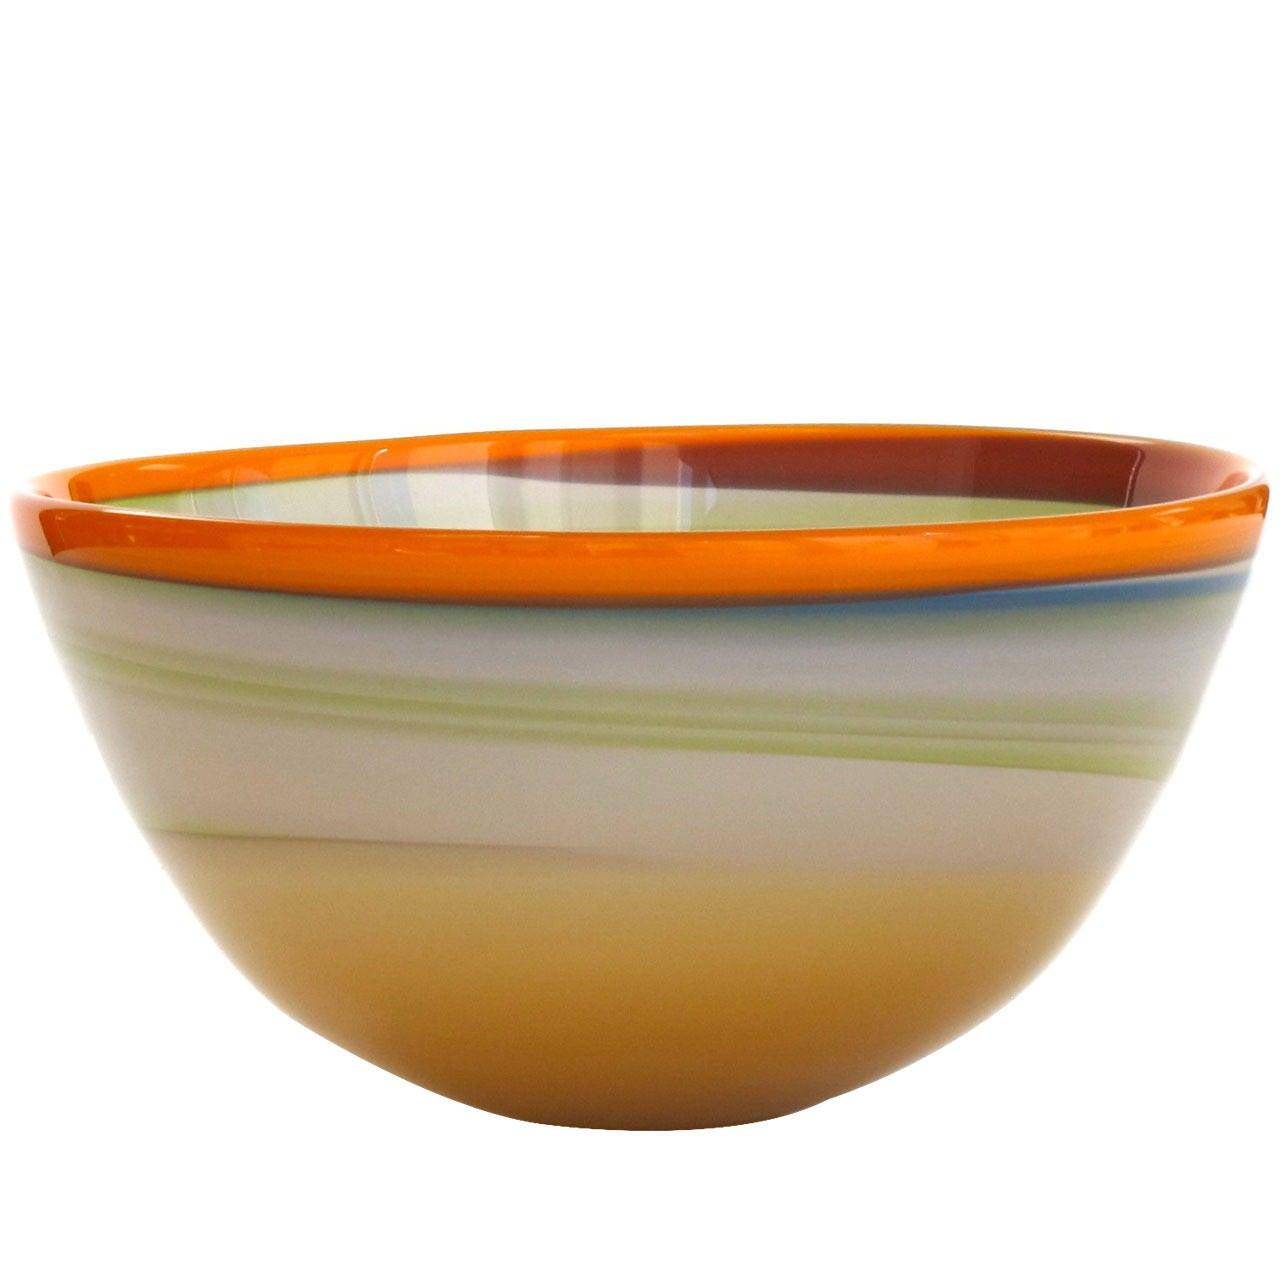 Polychrome Modern Art Glass Bowl By Misha Ignis At 1stdibs